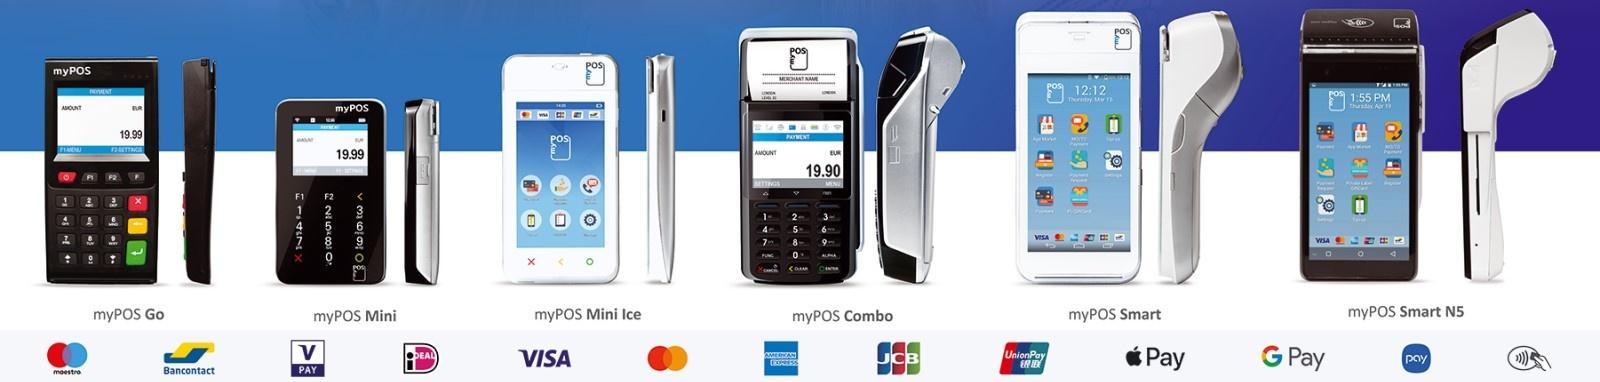 mijnPIN myPOS Mini ICE Combo Smart mobiele betaalautomaat